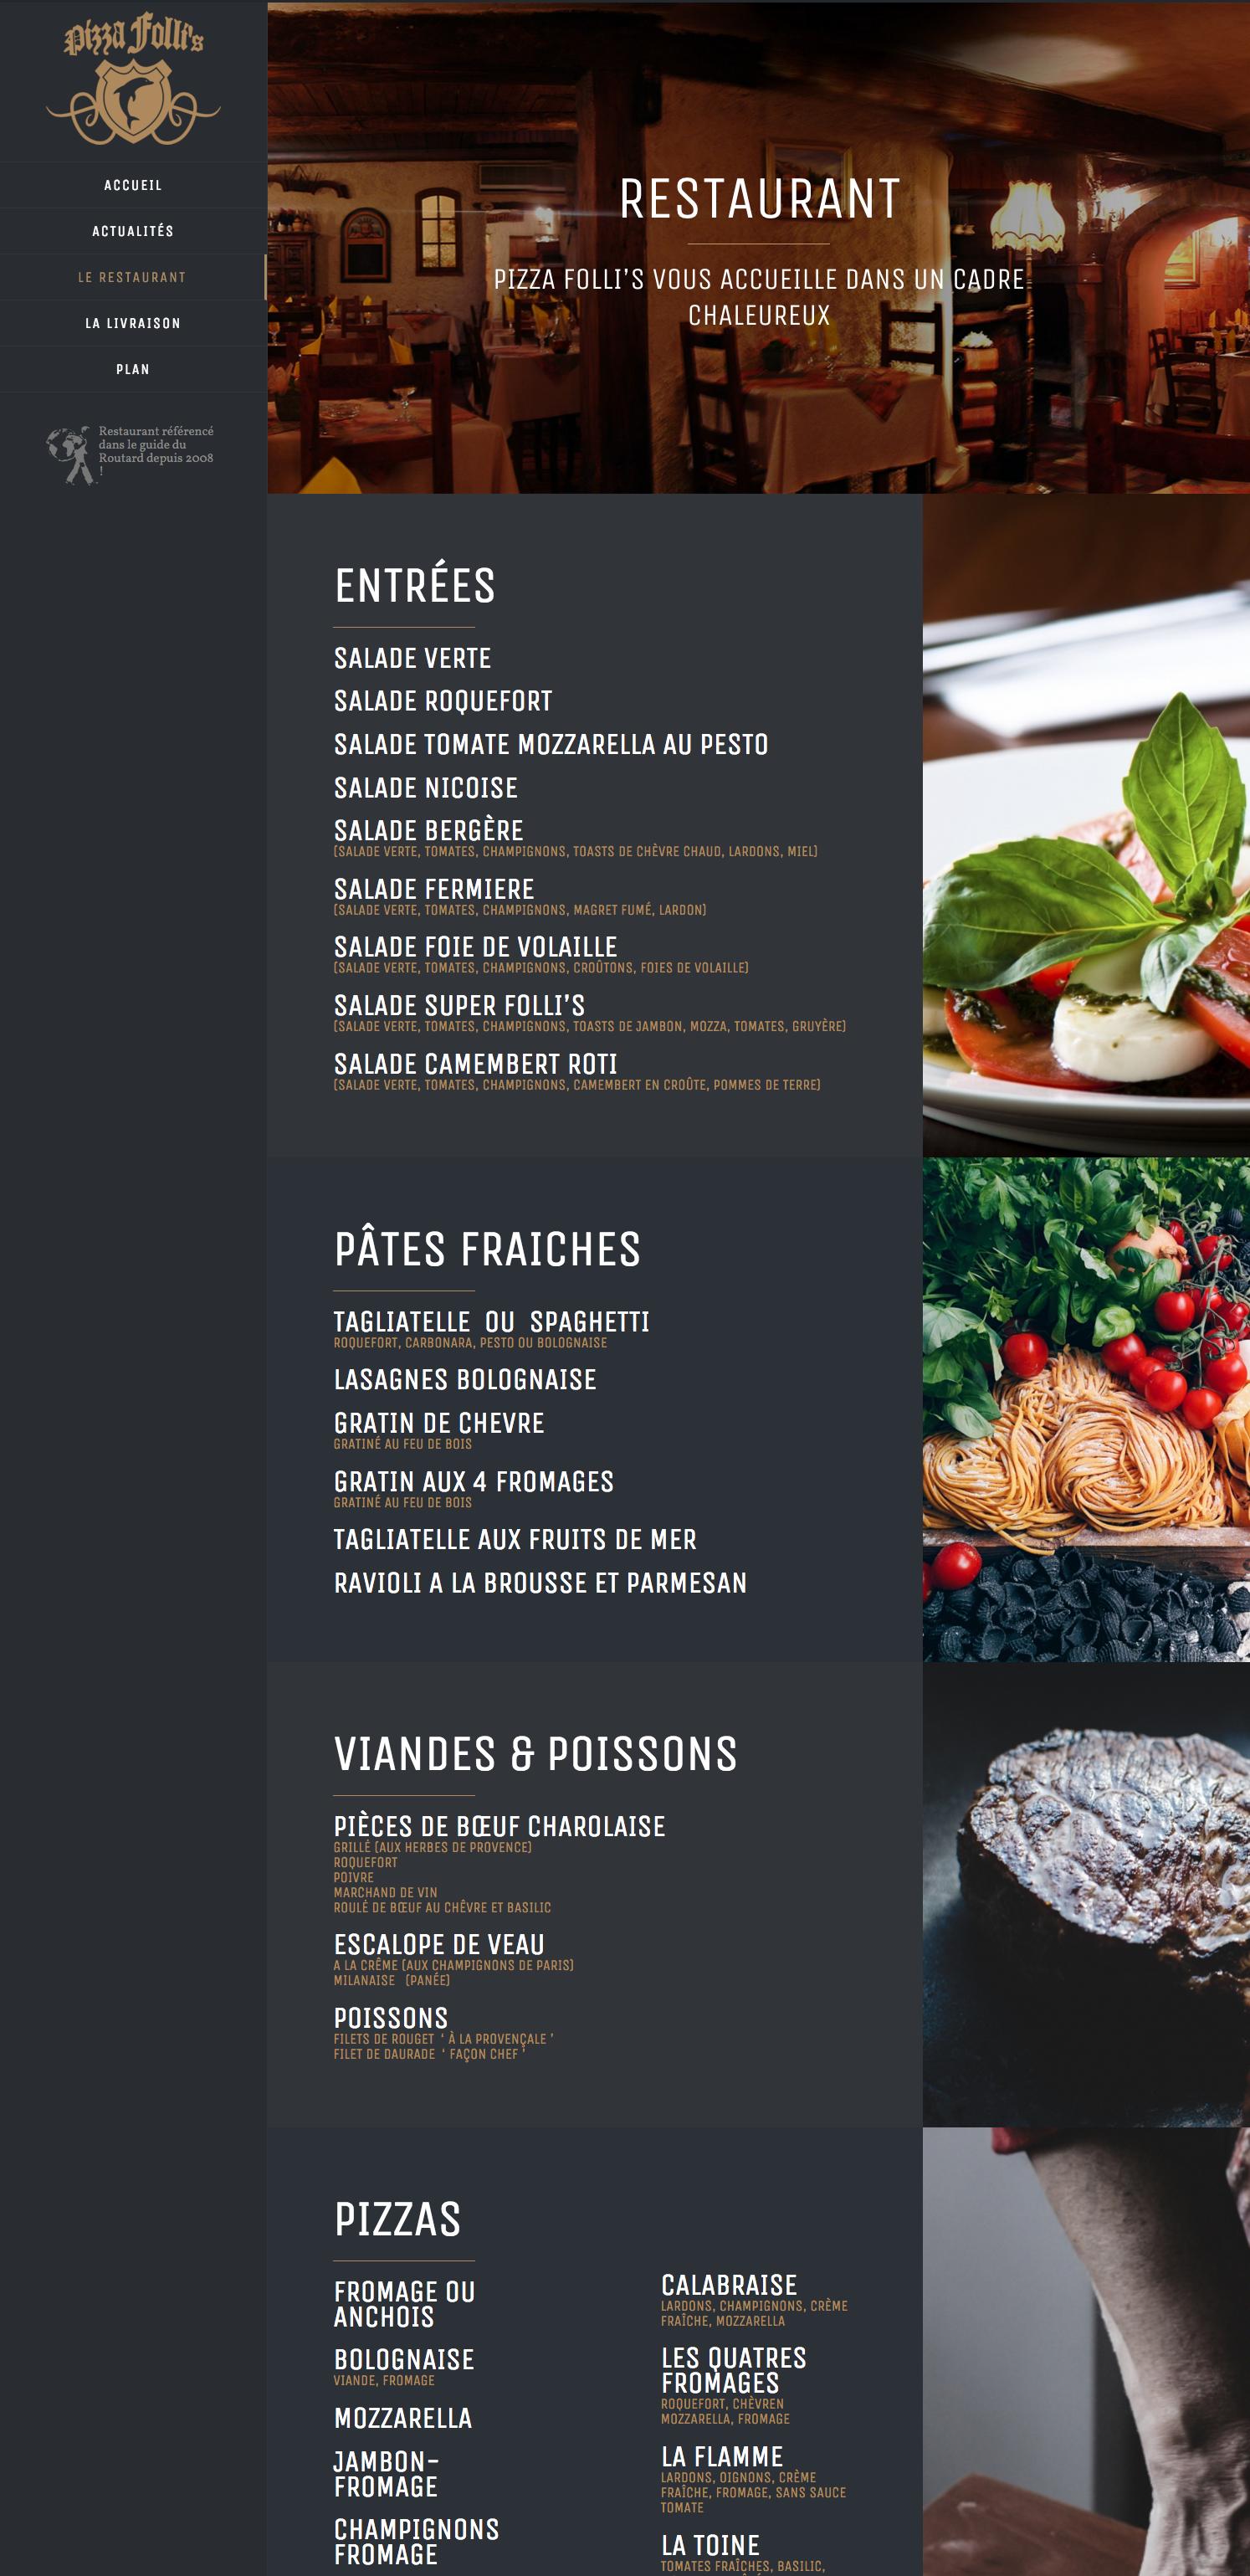 FireShot-Capture-5-La-carte-du-restaurant-I-Pizzeria-au-feu-de-b_-http___pizza-follis.com_carte_.png